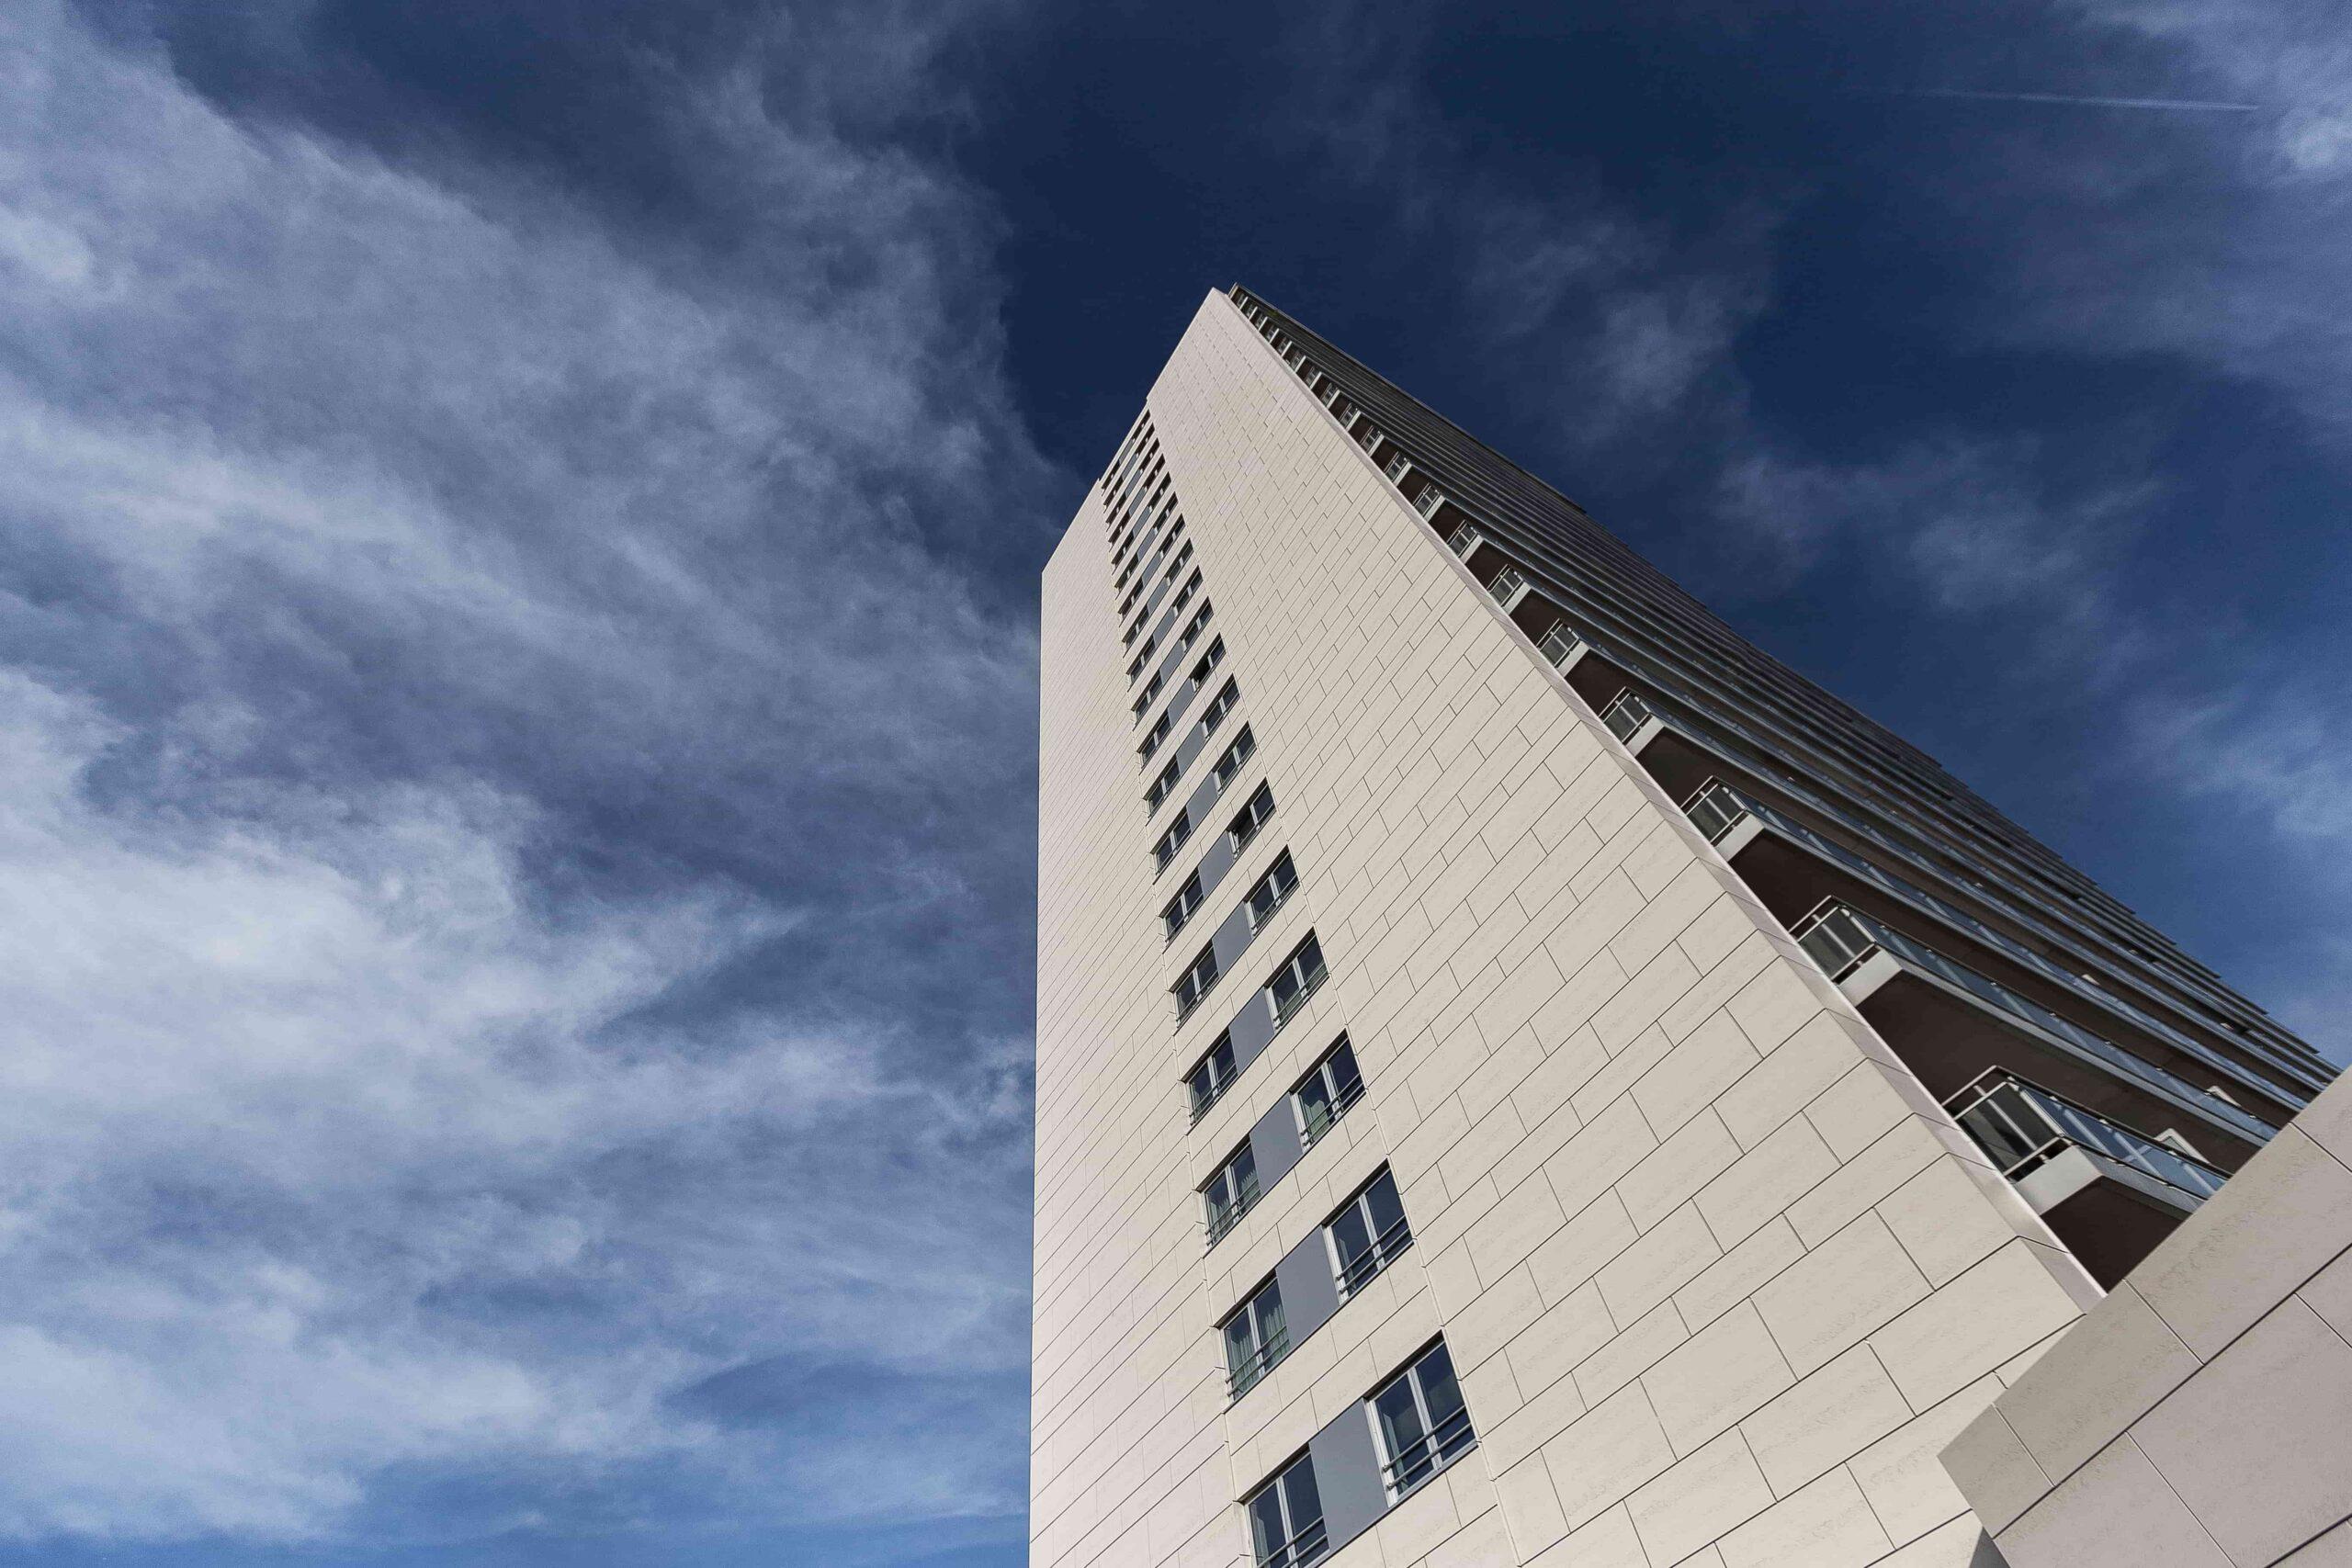 Torre Hooghe  - Cosentino tHoogheHuysAntwerpen PhotobyOrianaGomez Zerpa 300ppi 1 min scaled 37